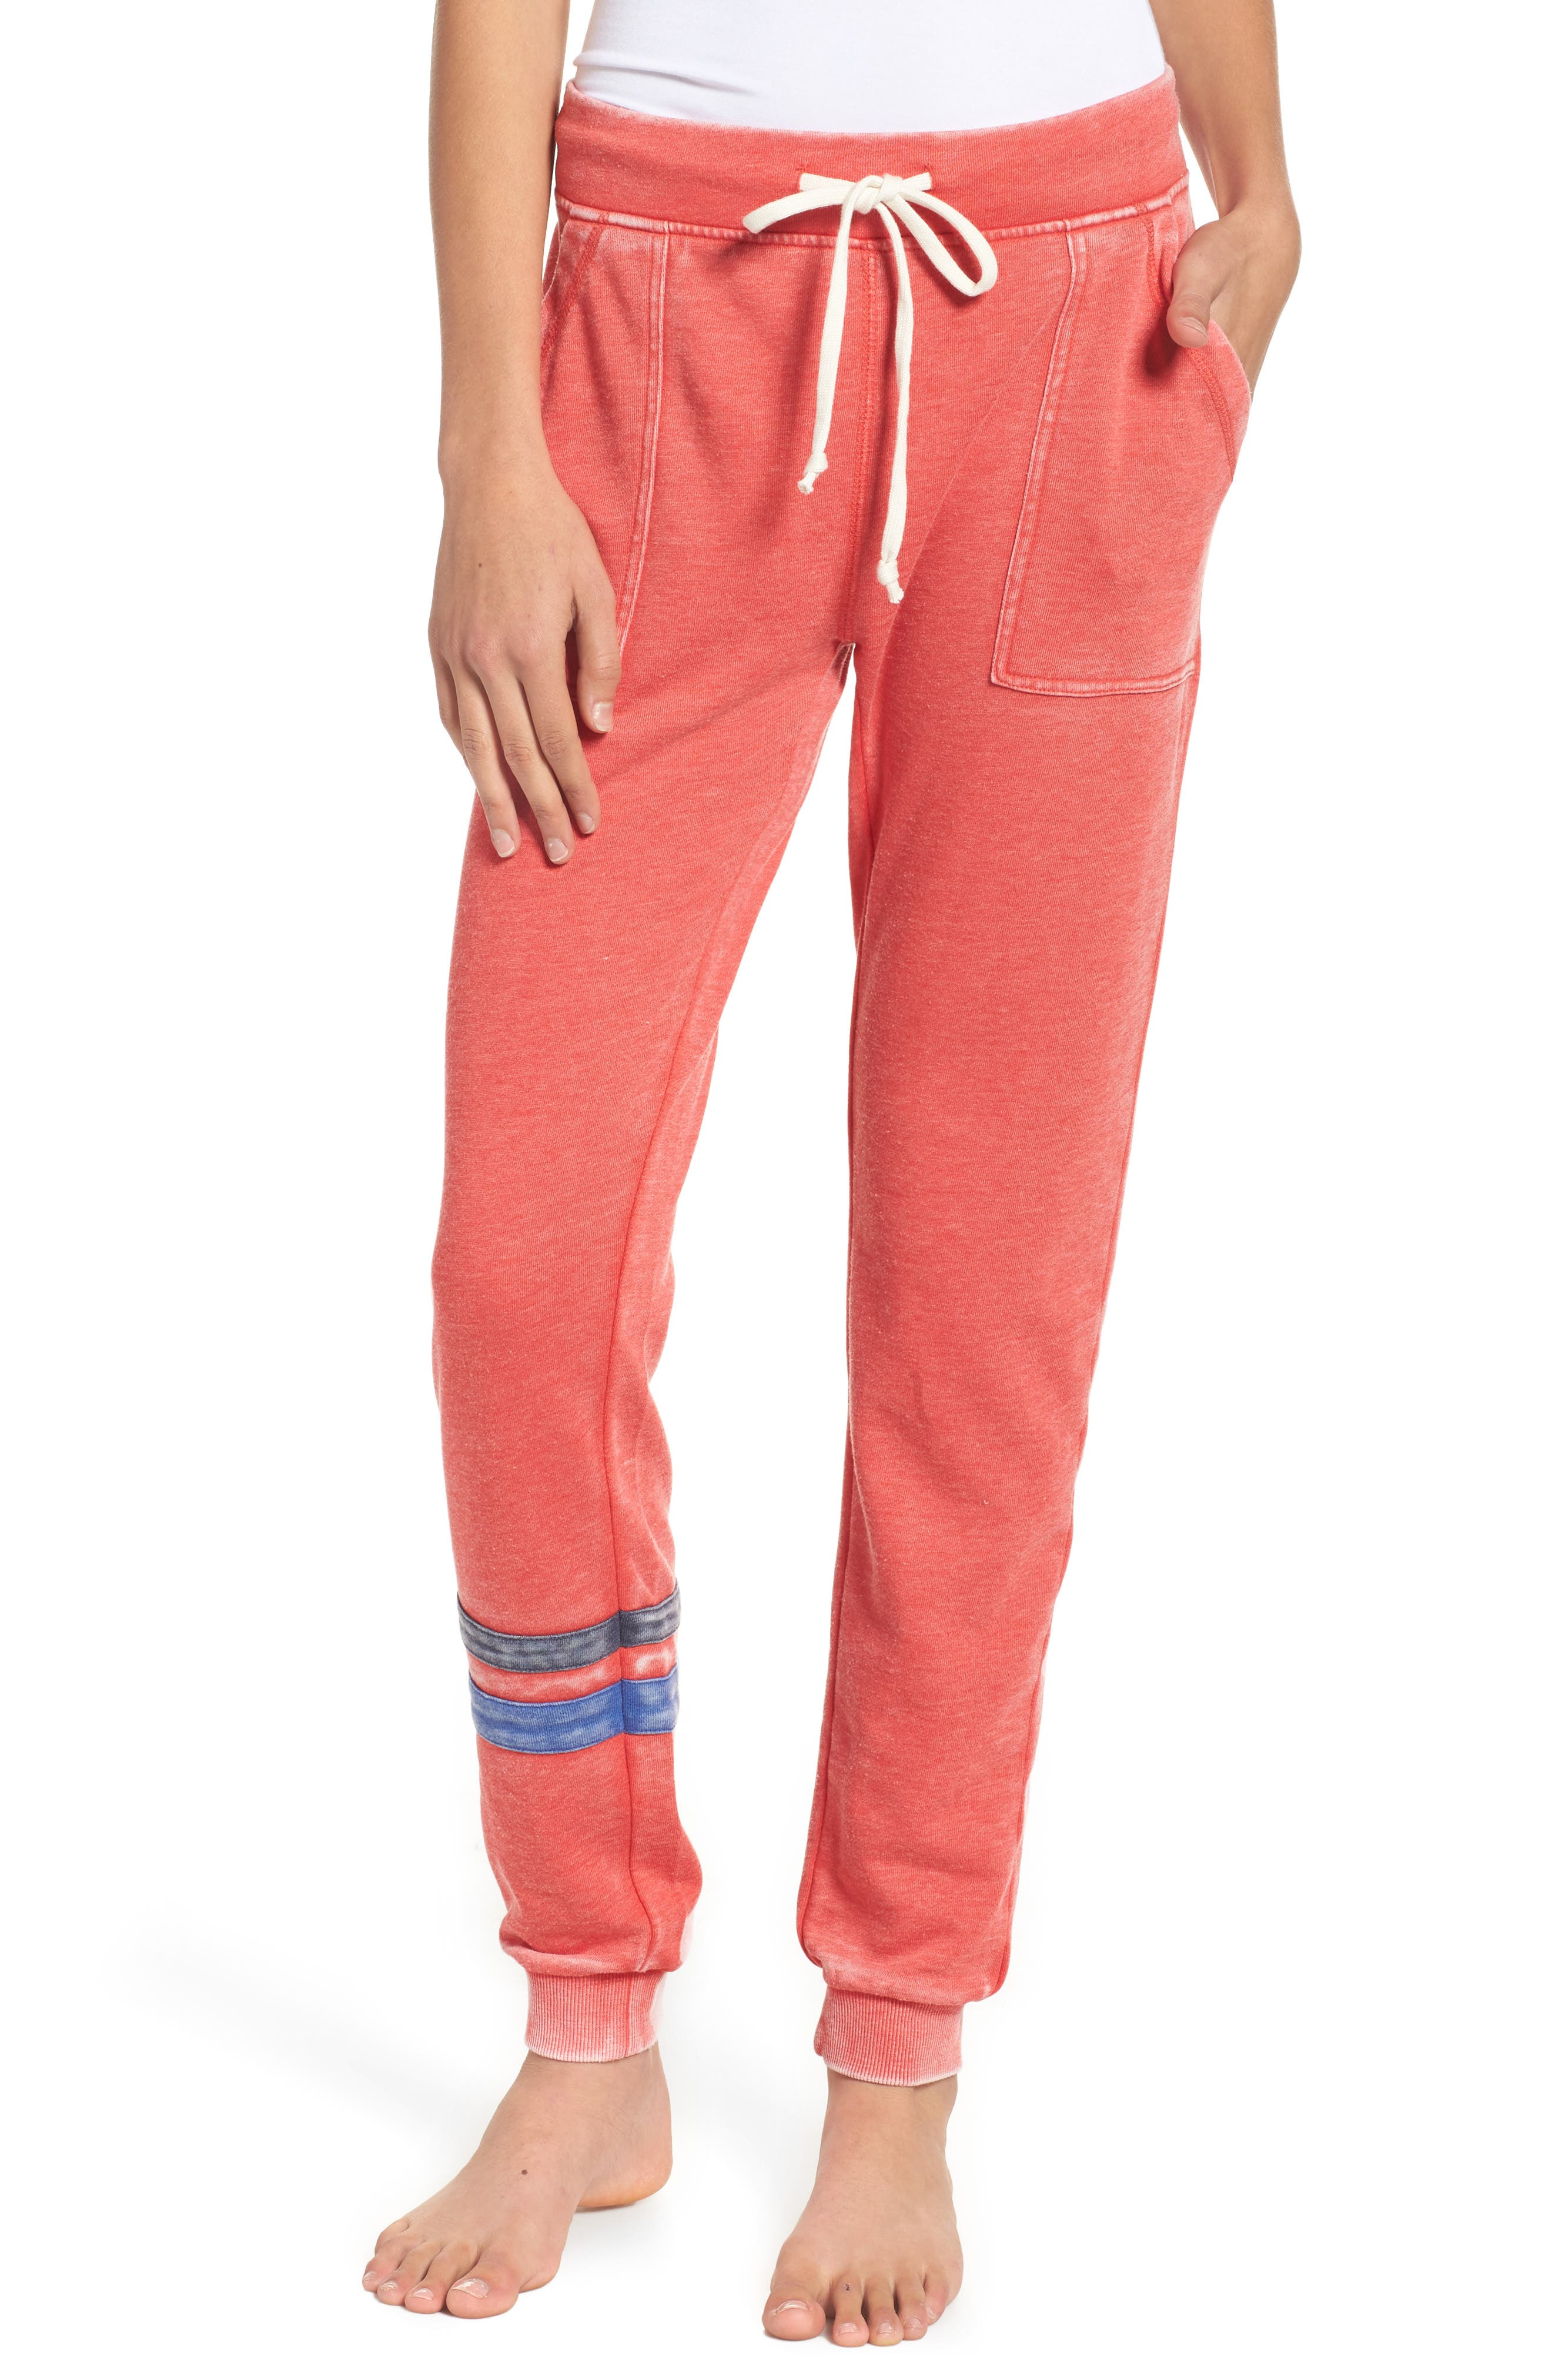 Long Weekend Lounge Jogger Pants,                             Main thumbnail 1, color,                             Red Bloom/ Dark Navy/ Blue